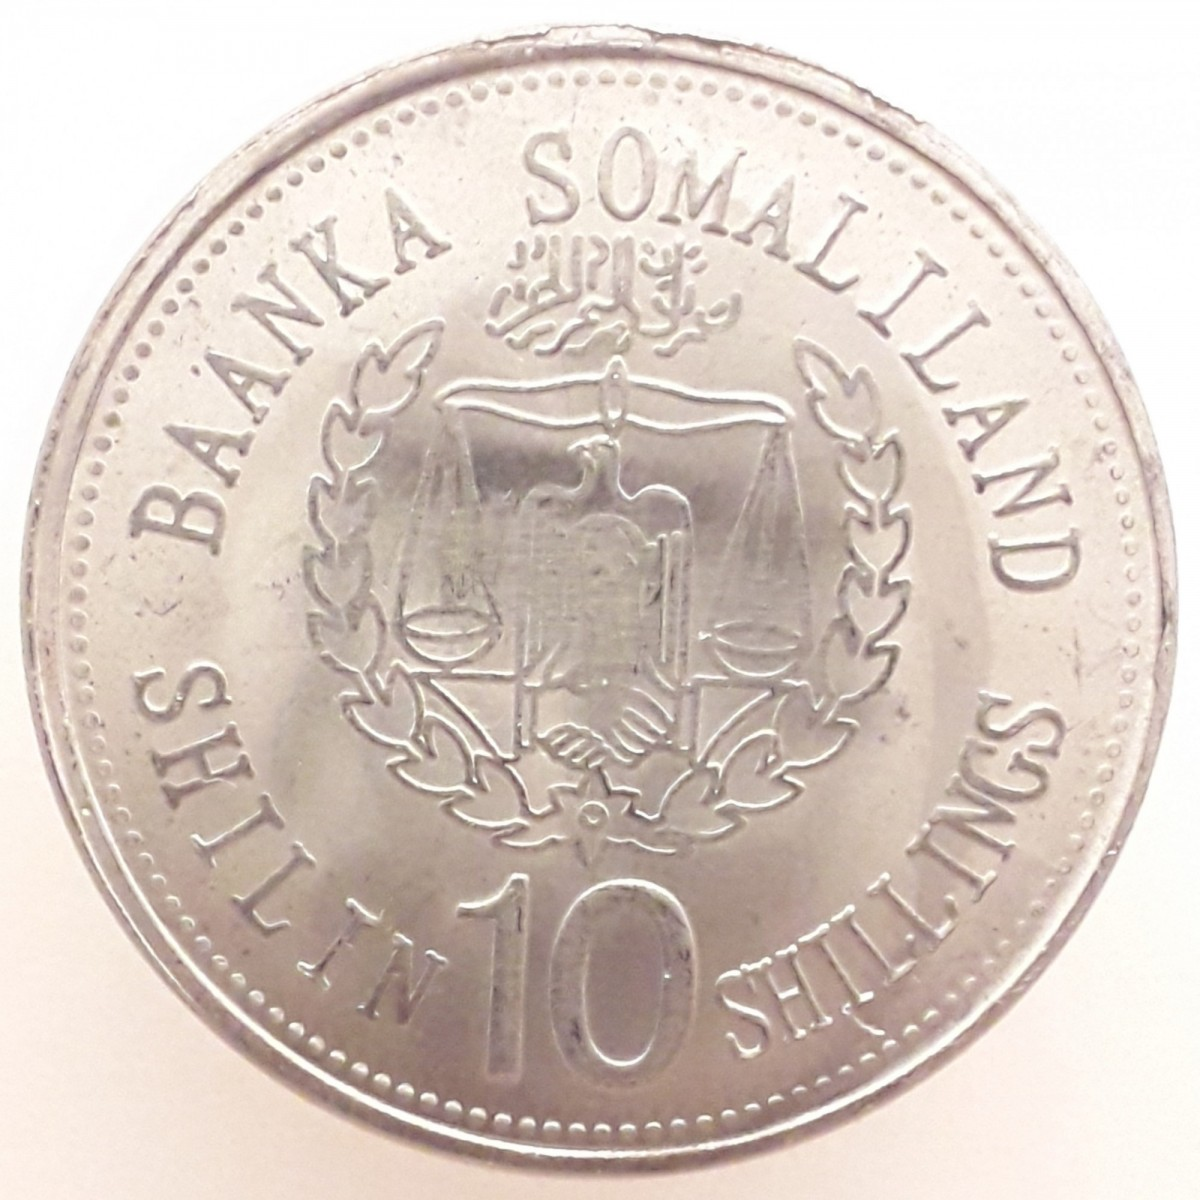 Сомалиленд 10 шиллингов 2012 года - Свинья код 22638